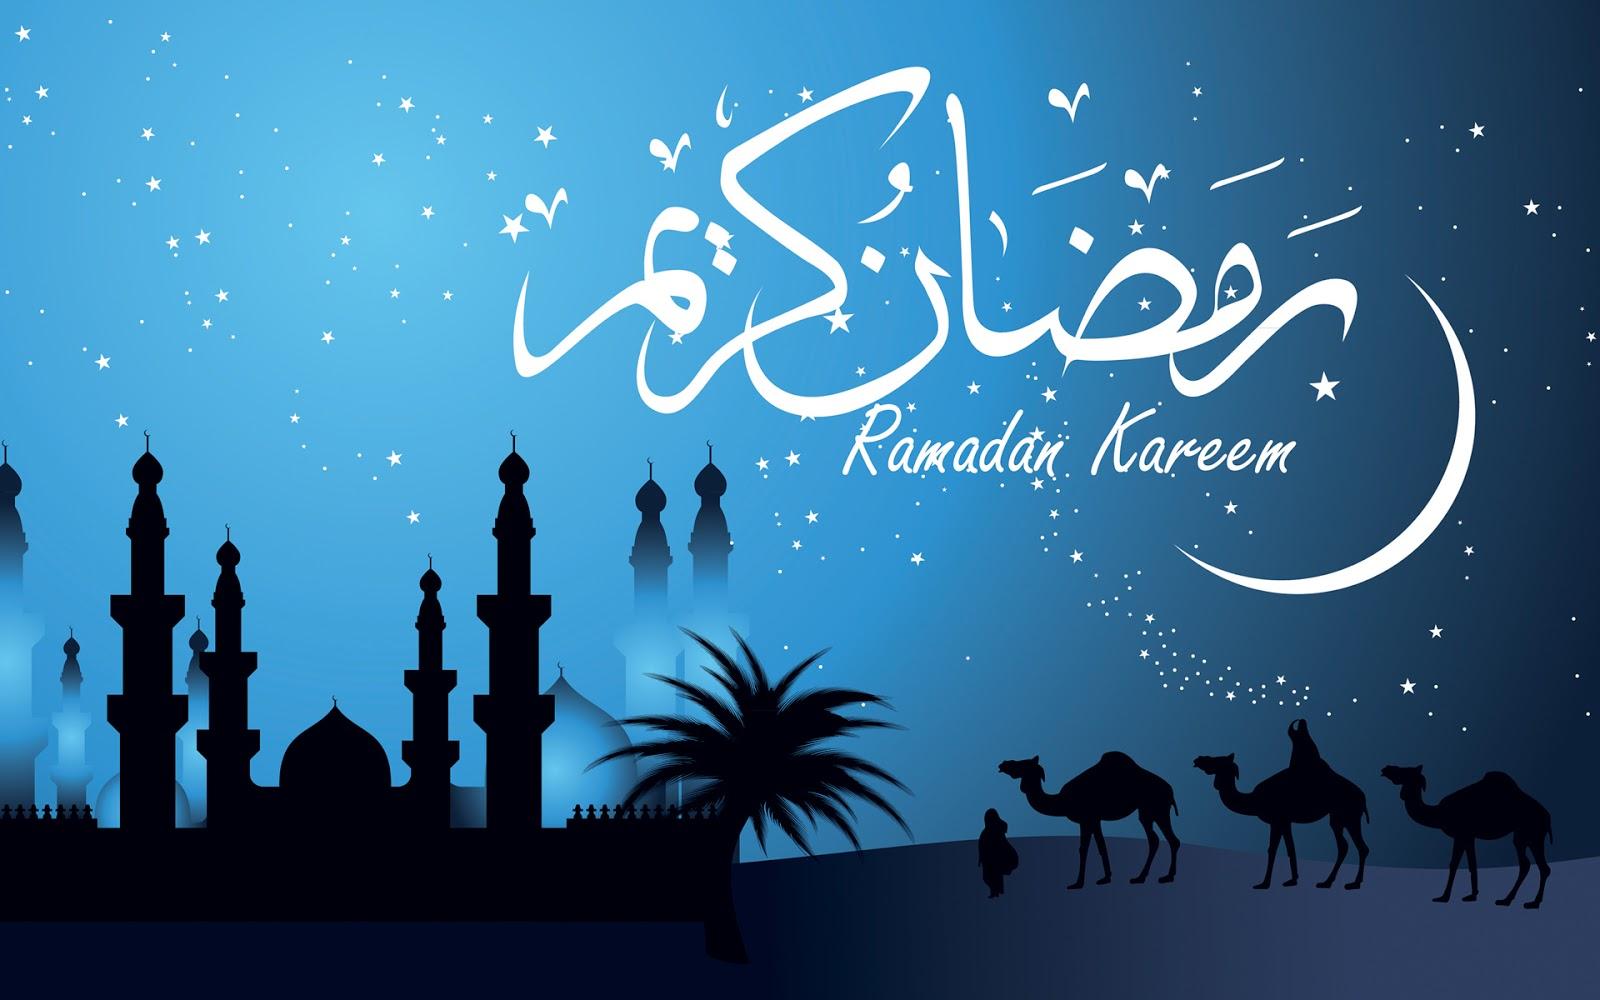 Ramadan mubarak 2017 wishesramadan sms whatsapp messagesquotes gul ne gulshan se gul faam bheja hai sitaroon ne asmaan se salam bheja hai mubarak ho aapko ramadan ka mahina ye paigham hamnain sirf apko bheja hai m4hsunfo